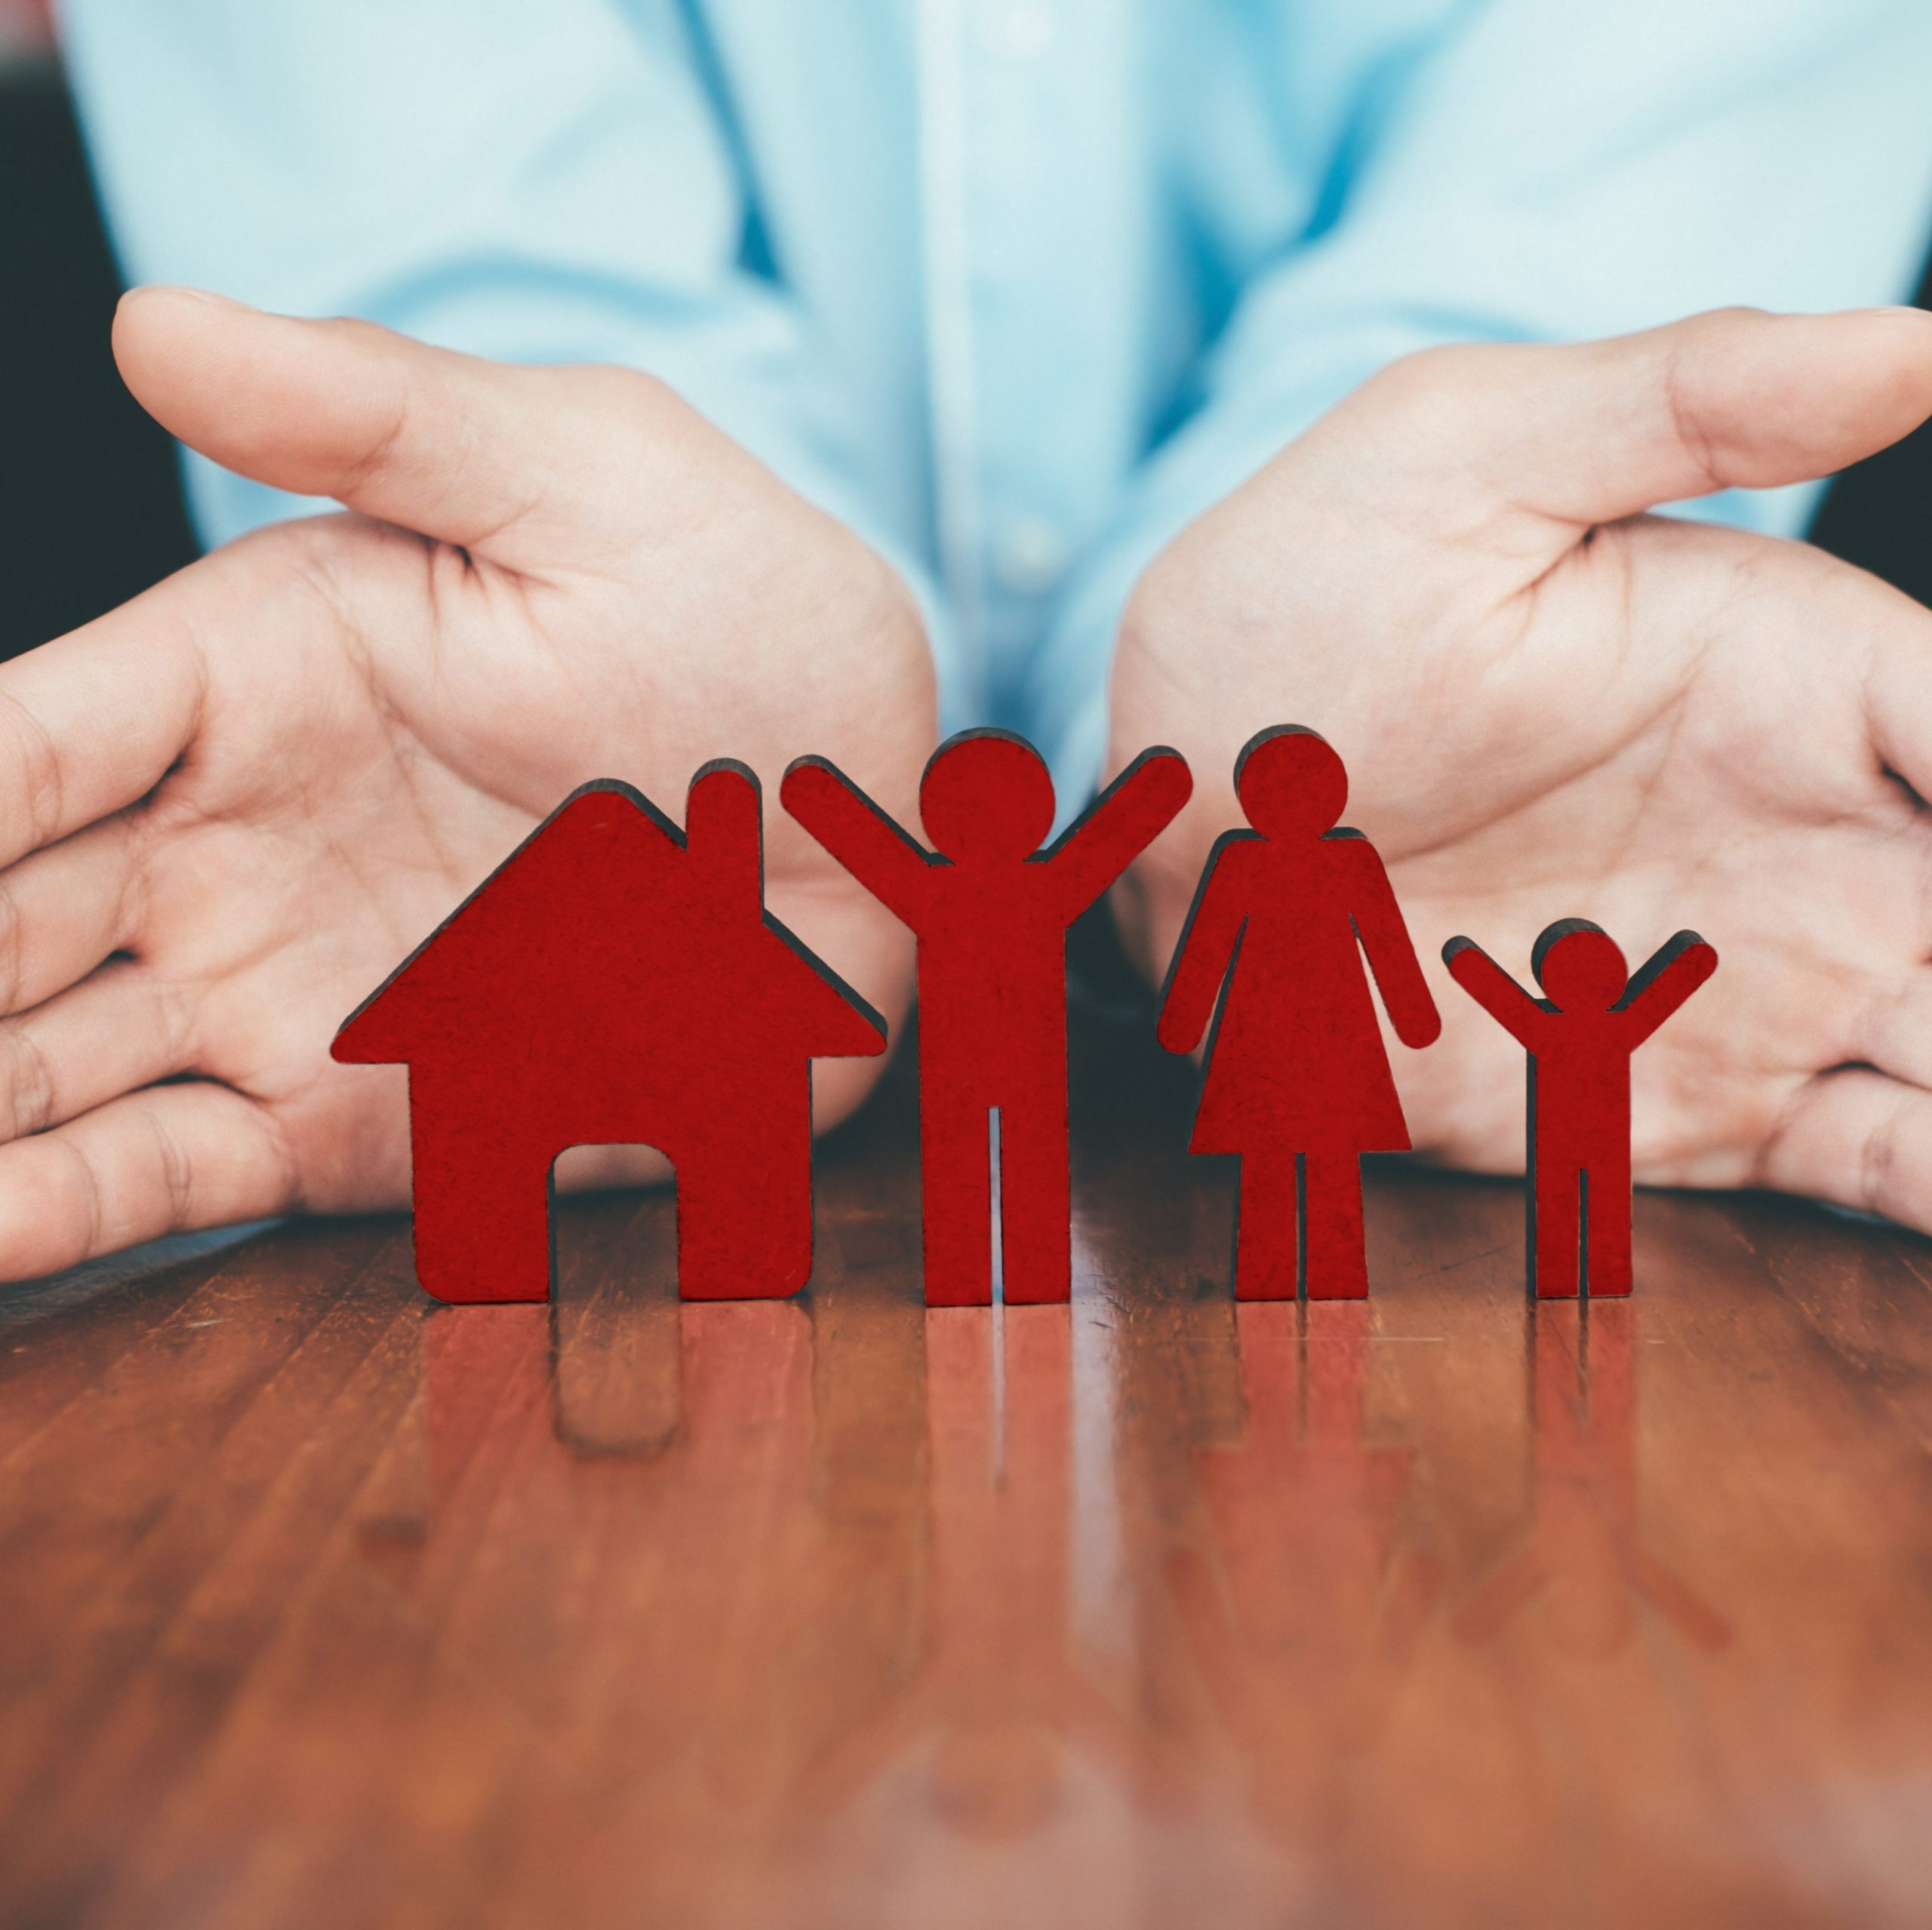 Managing life insurance asset